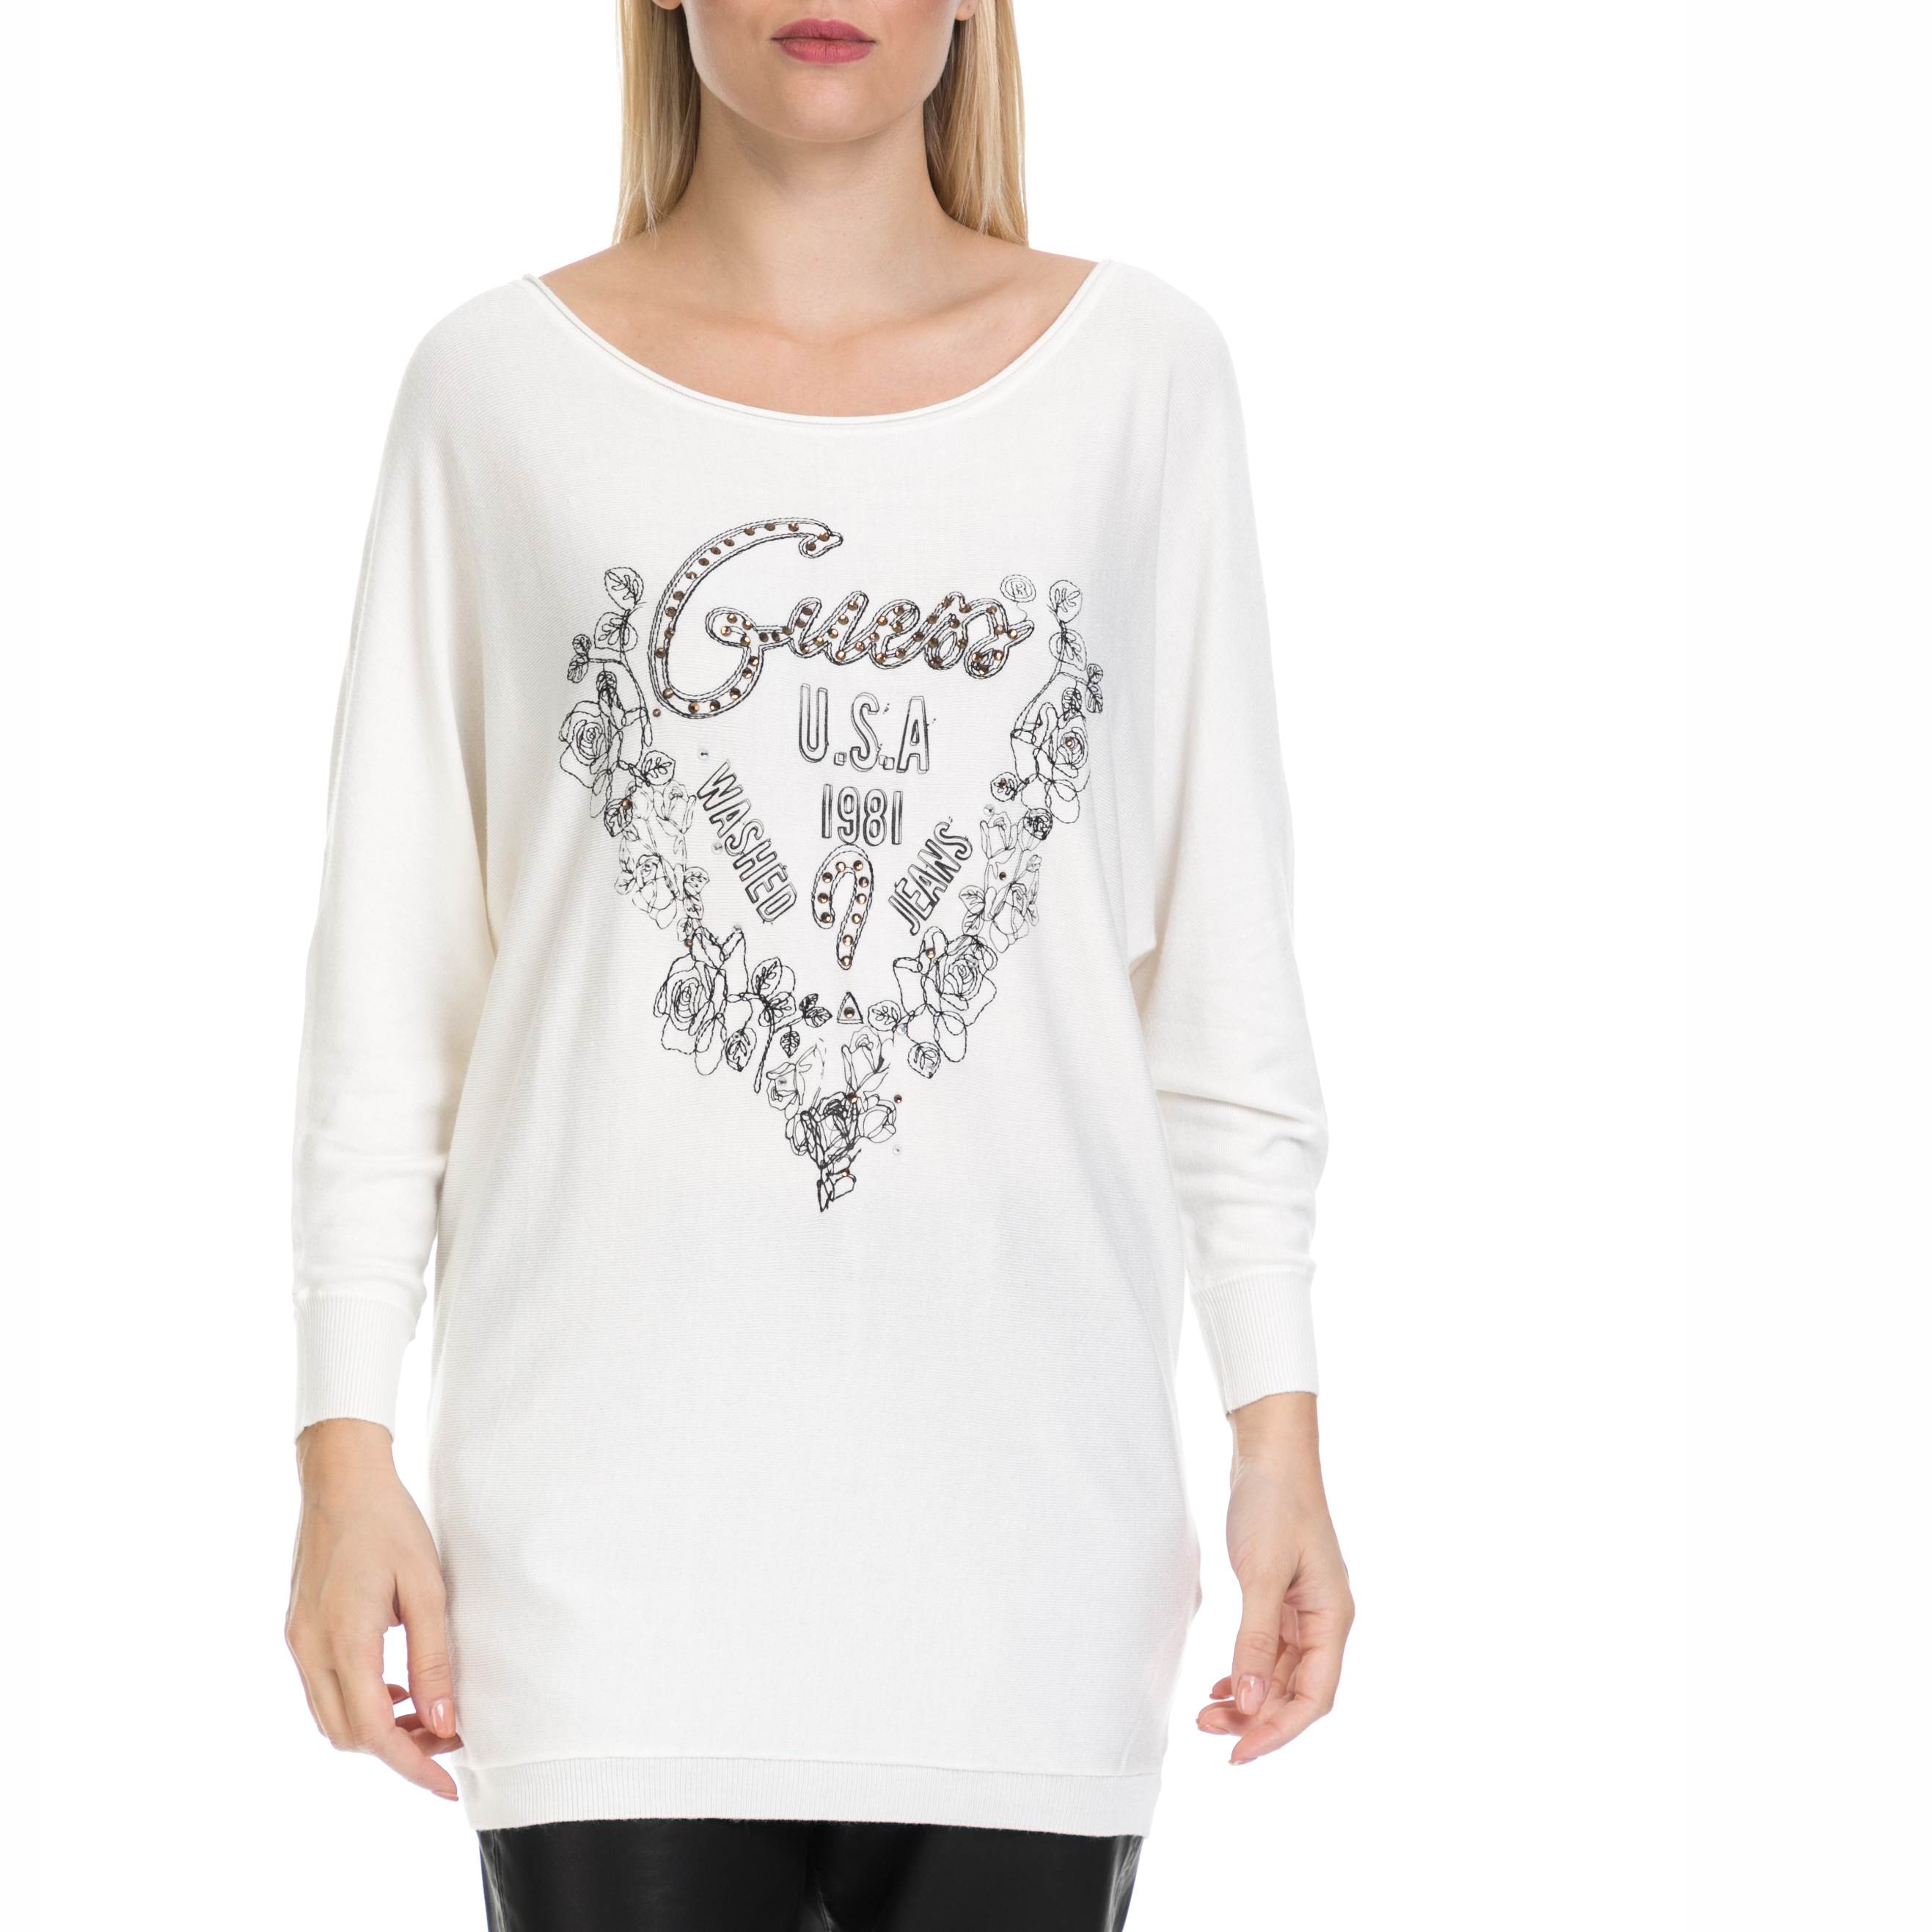 GUESS - Γυναικεία μπλούζα LEA GUESS λευκή ⋆ egynaika.gr 212deefc1f0